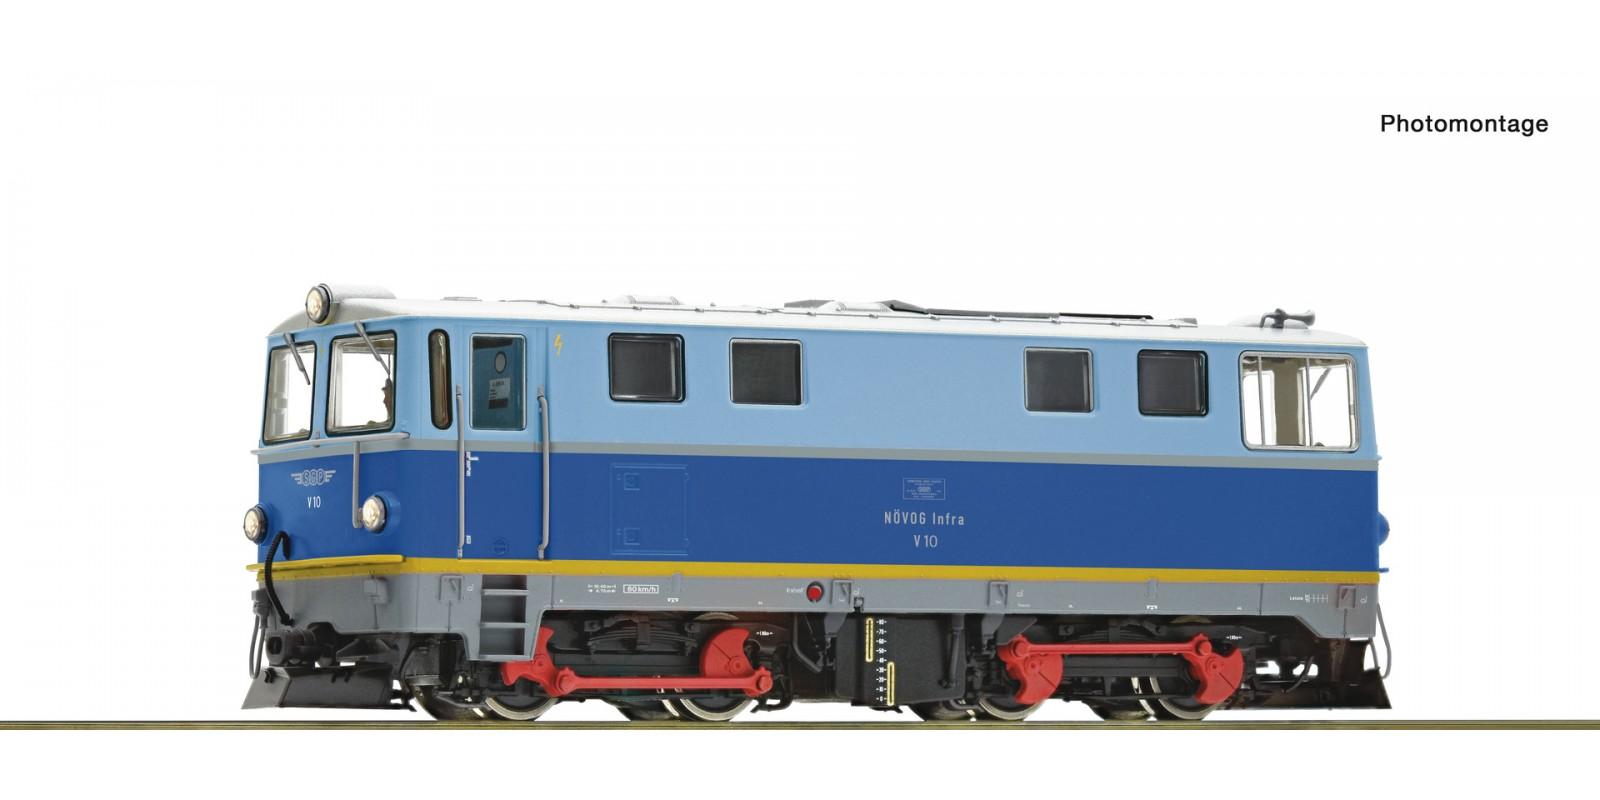 RO33317 Diesel locomotive V 15